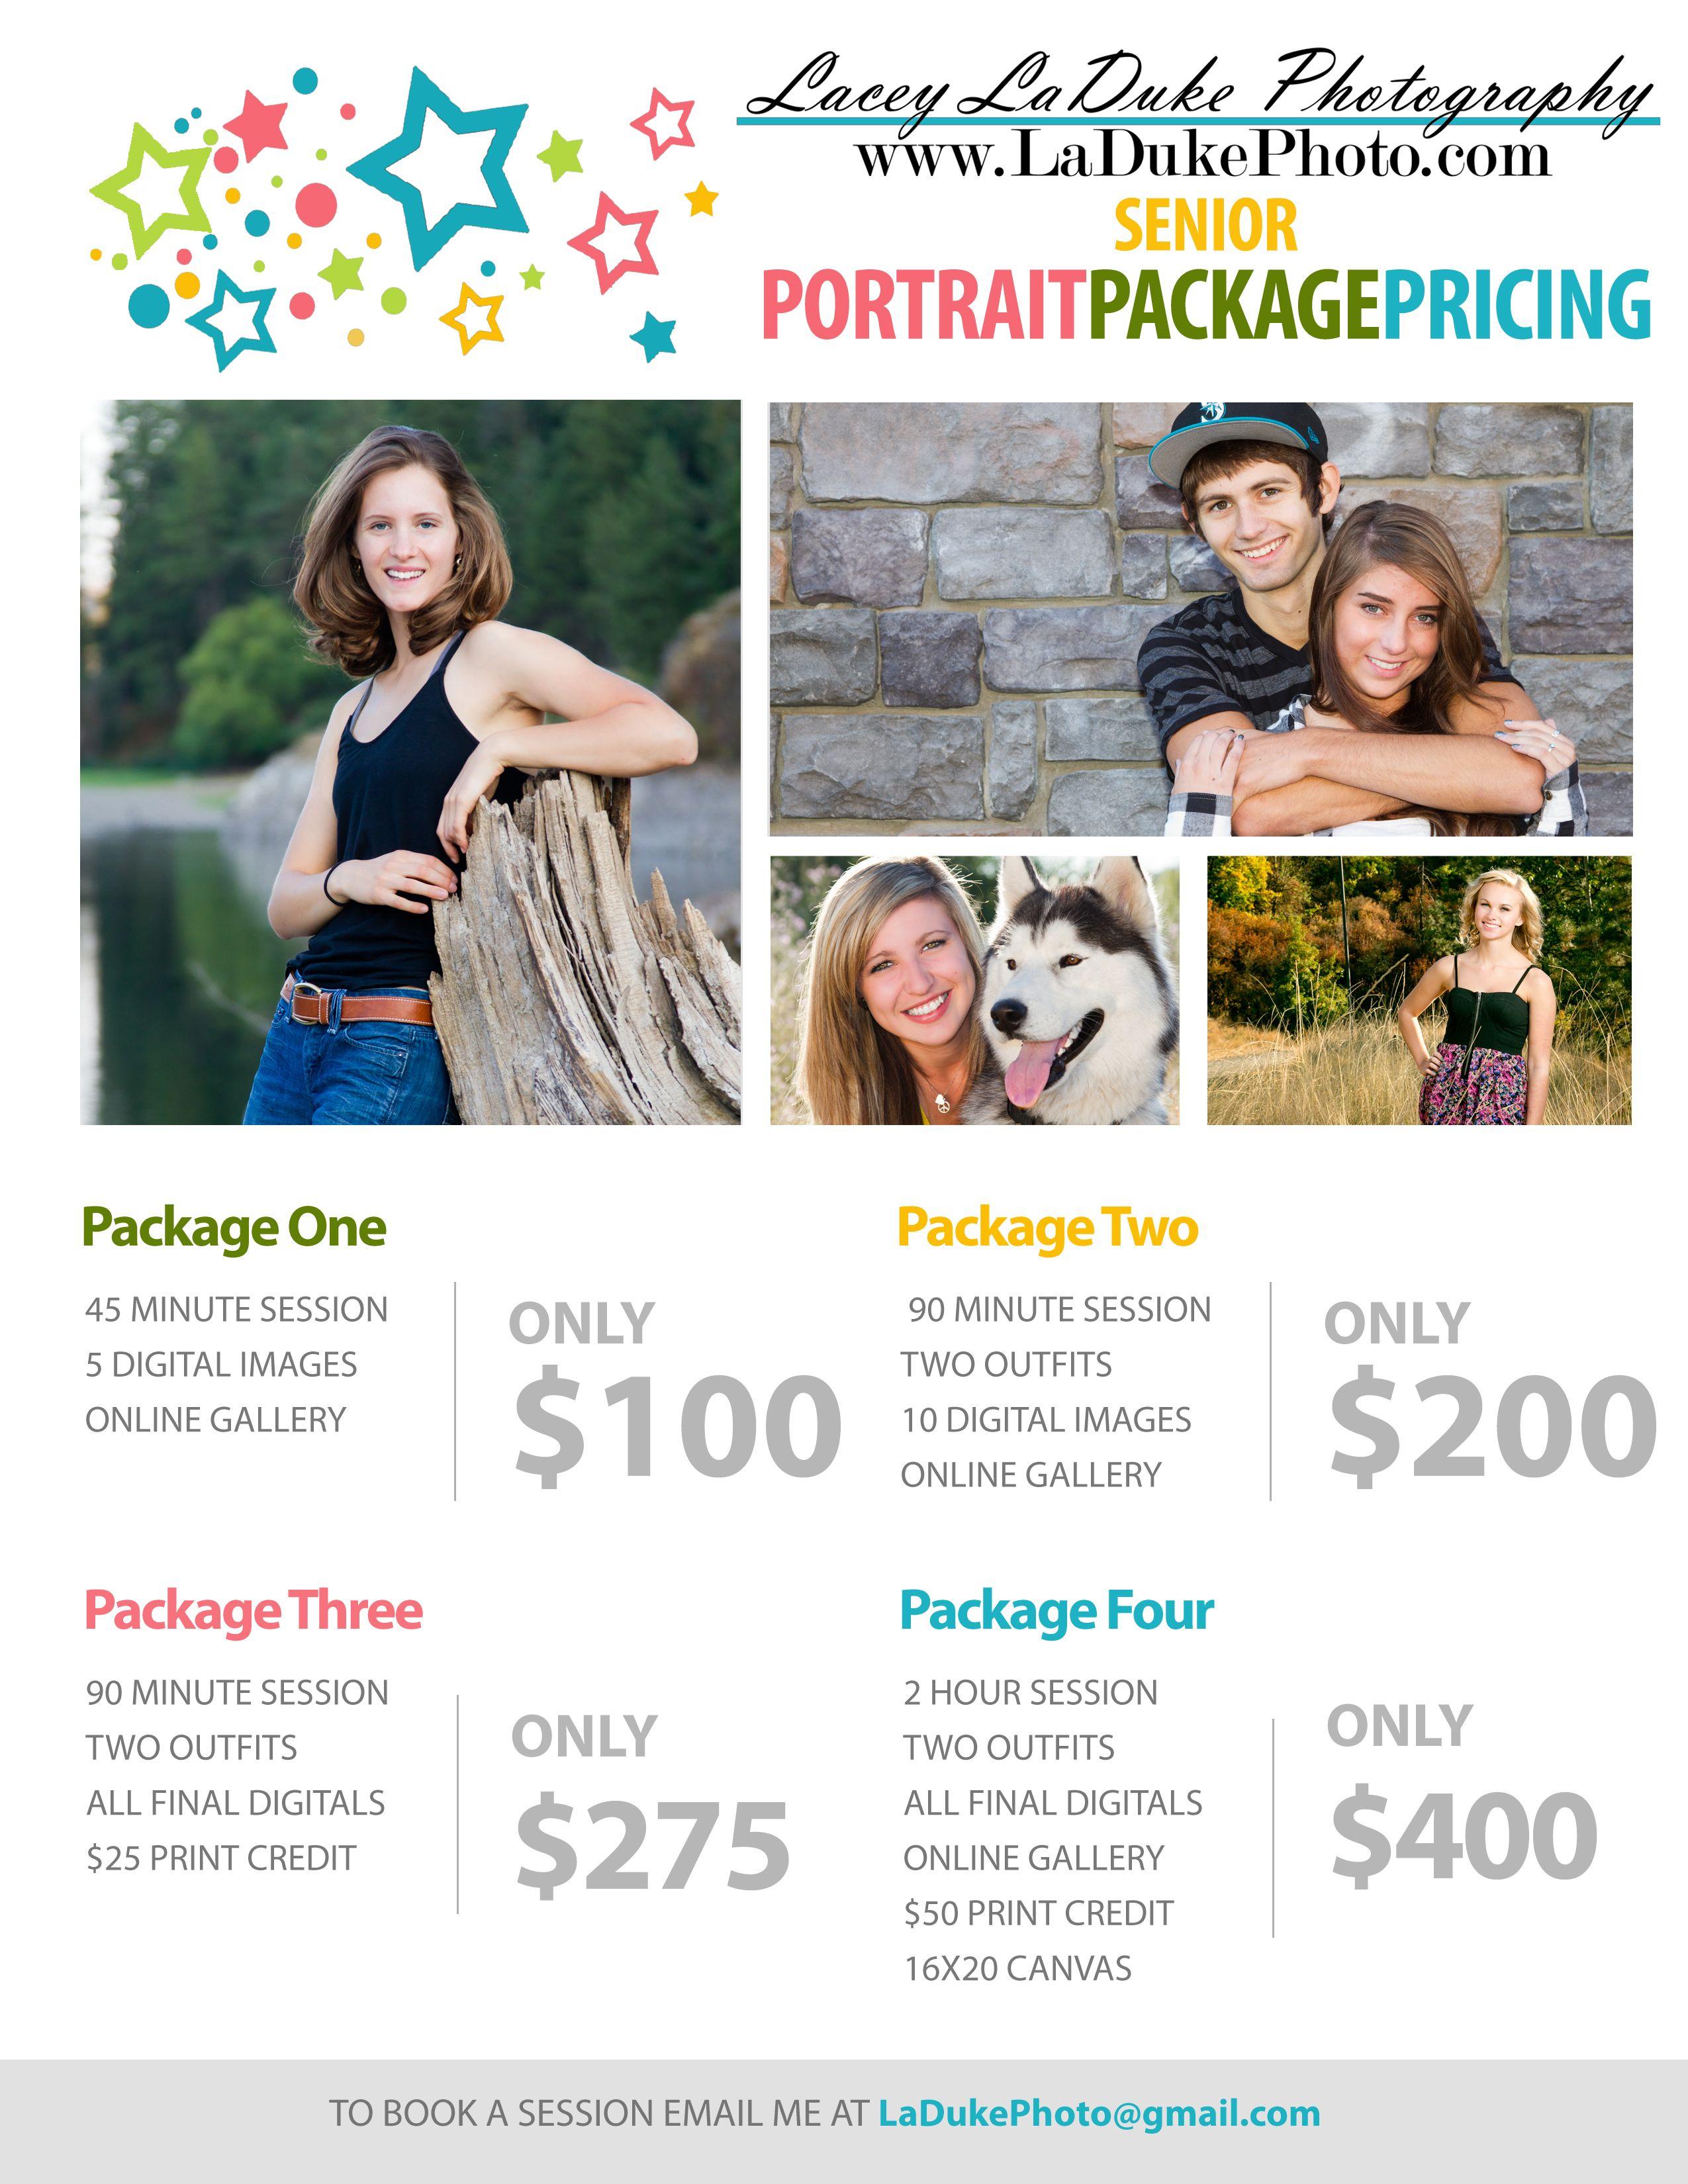 Eugene Senior Portrait Photographer – Pricing and Specials